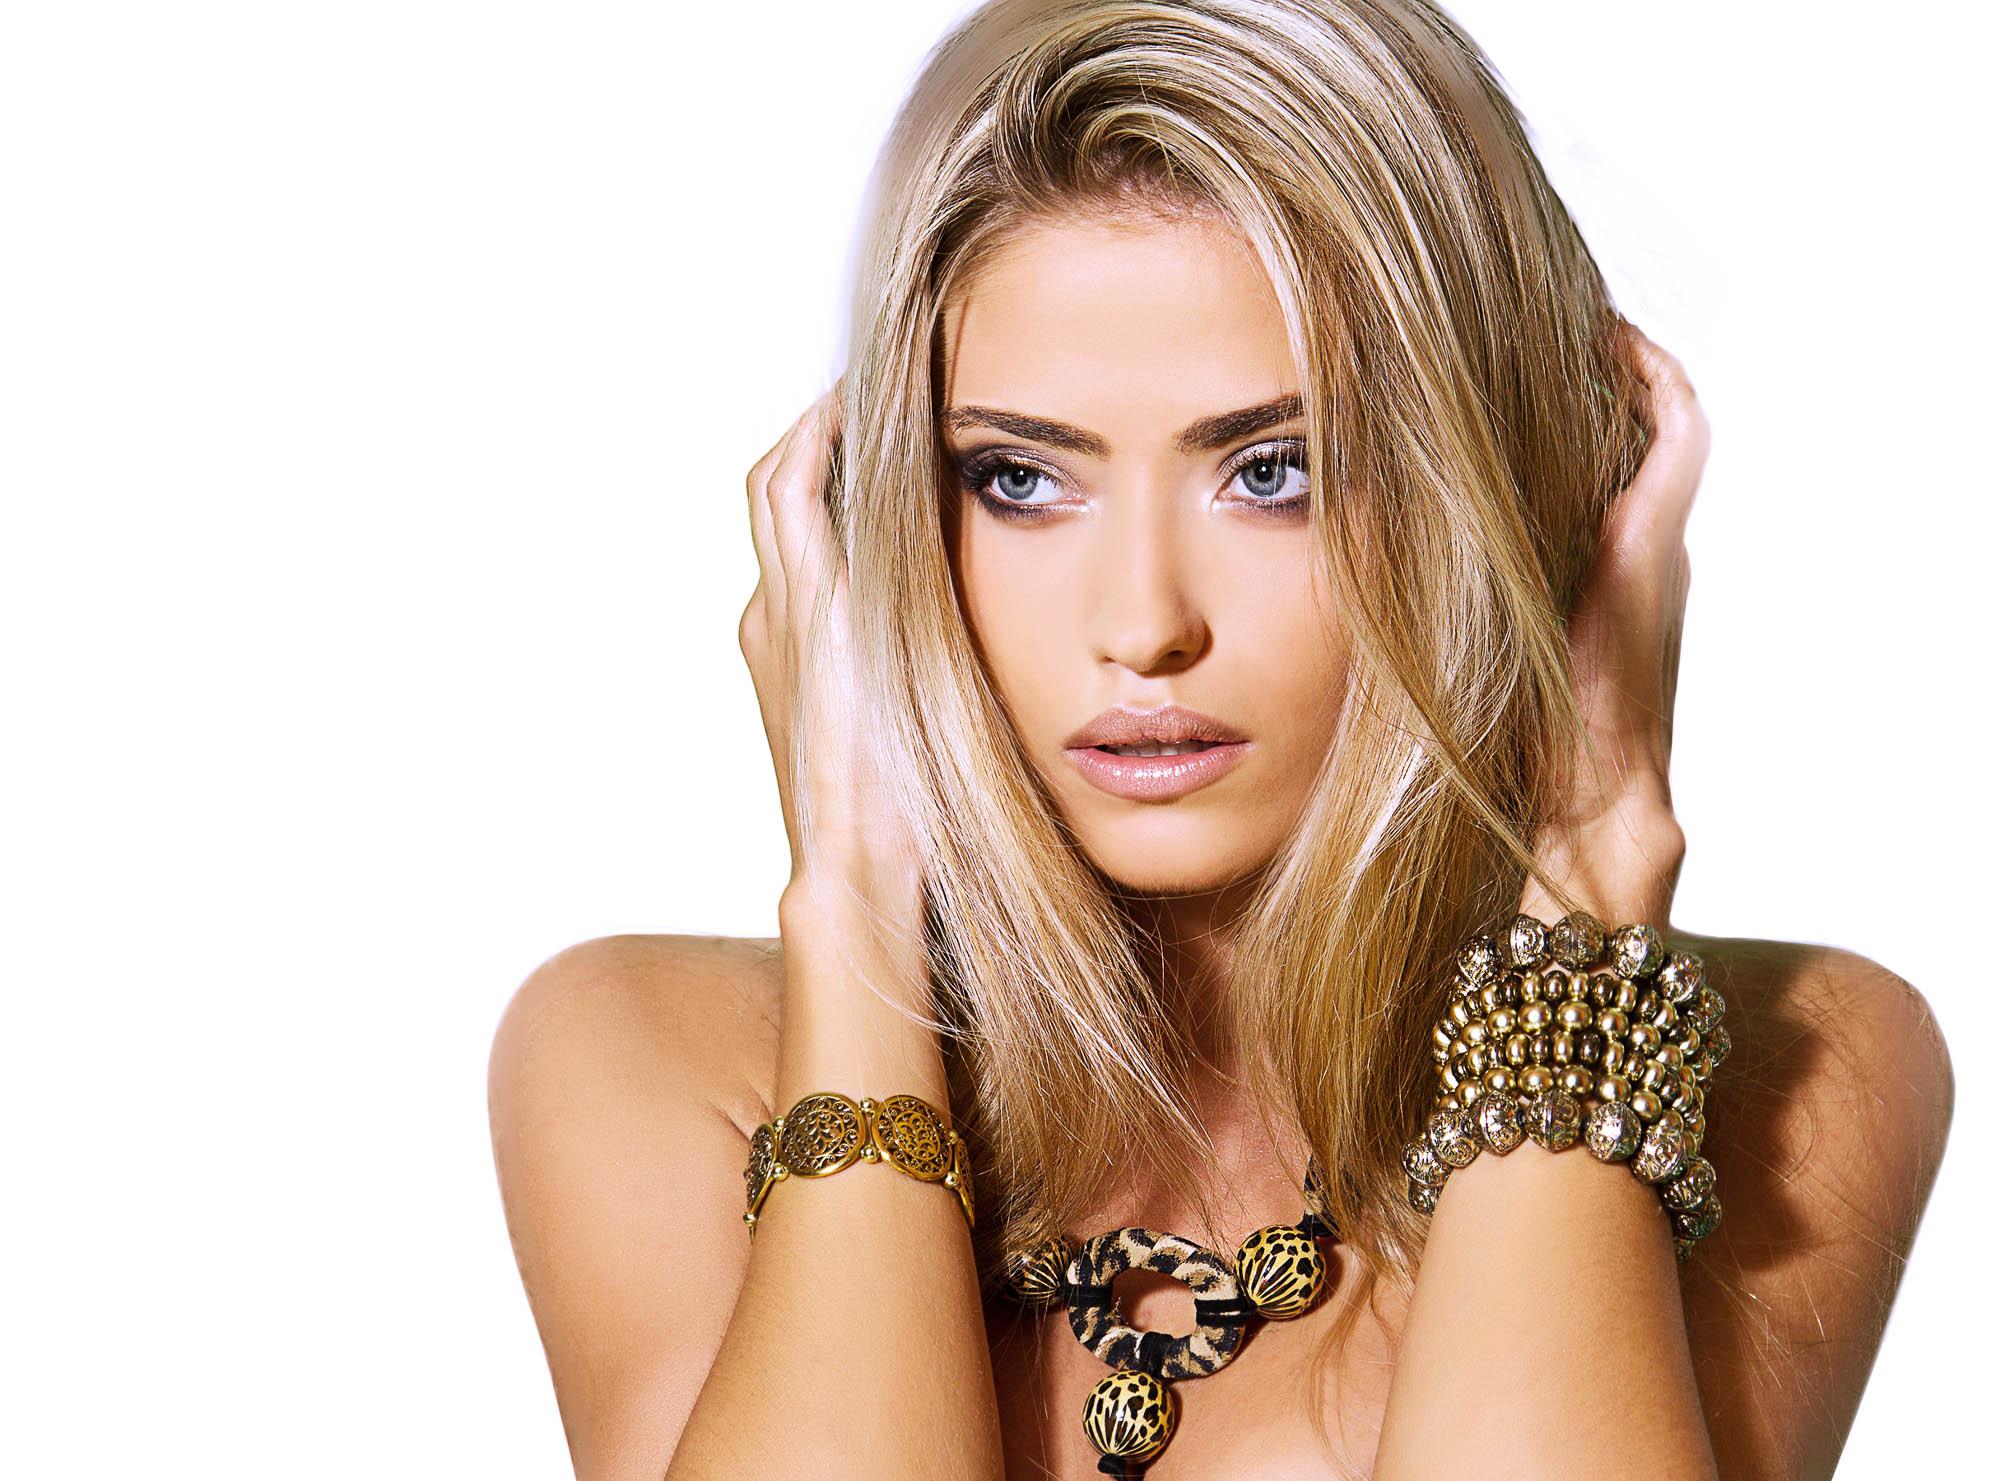 Fashion E Beauty: Fotograf Für Mode, Beauty, Werbung, Lifestyle, Video